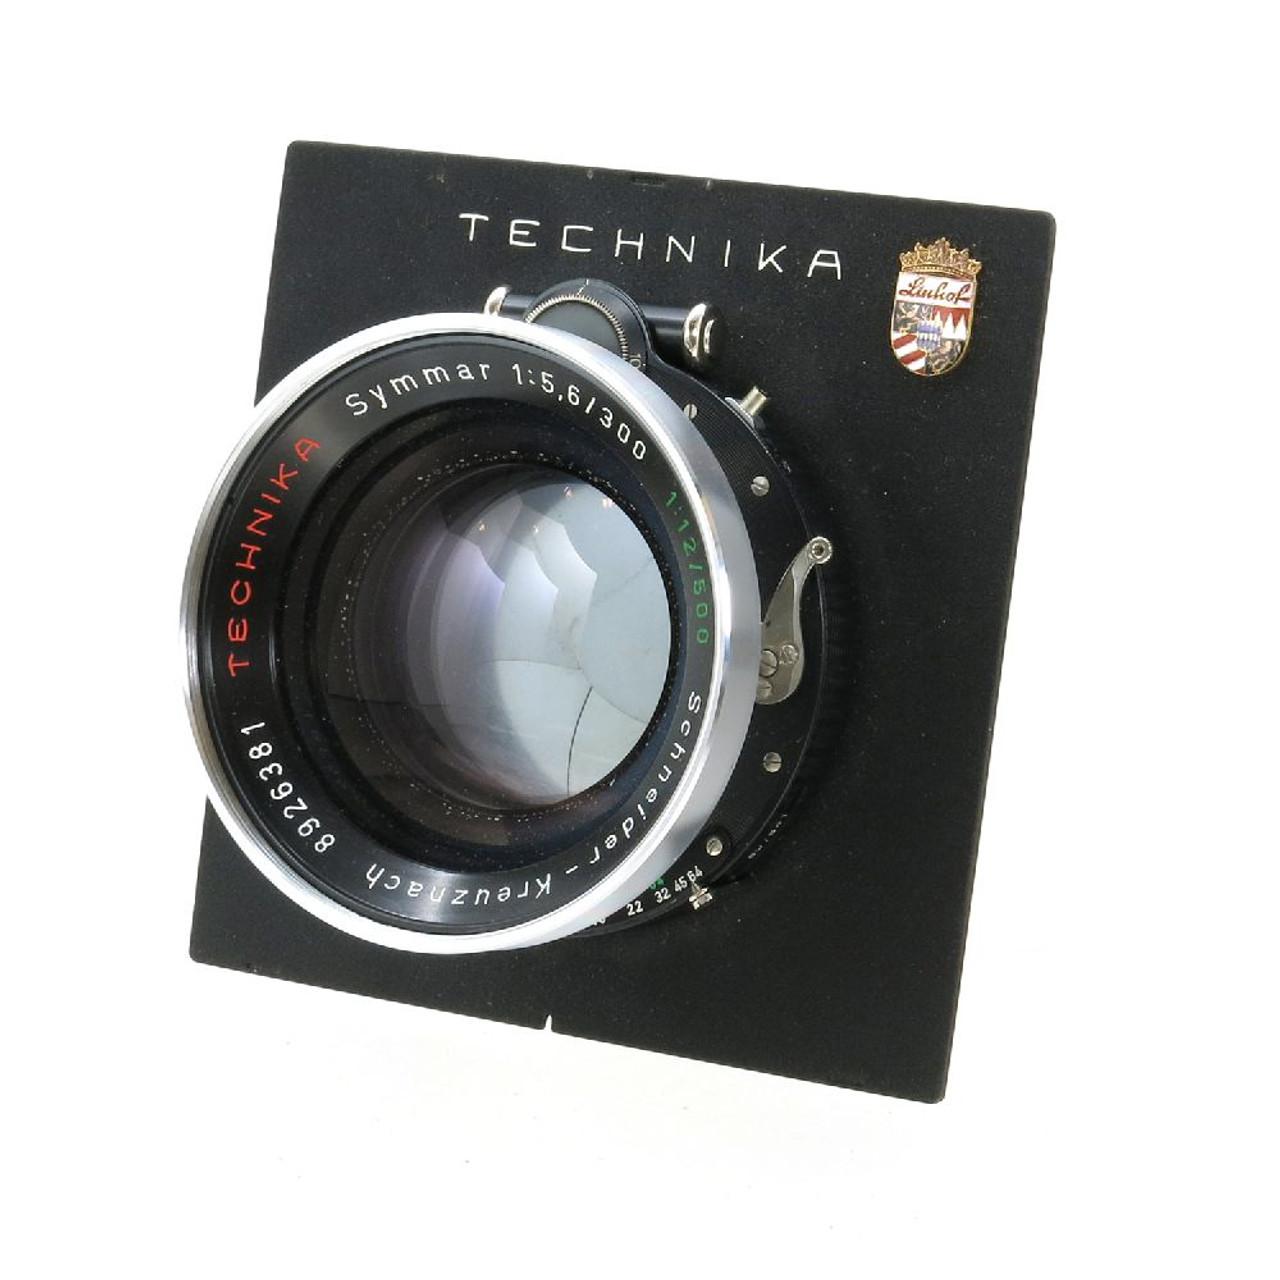 USED SCHNEIDER 300 F5.6/500F12